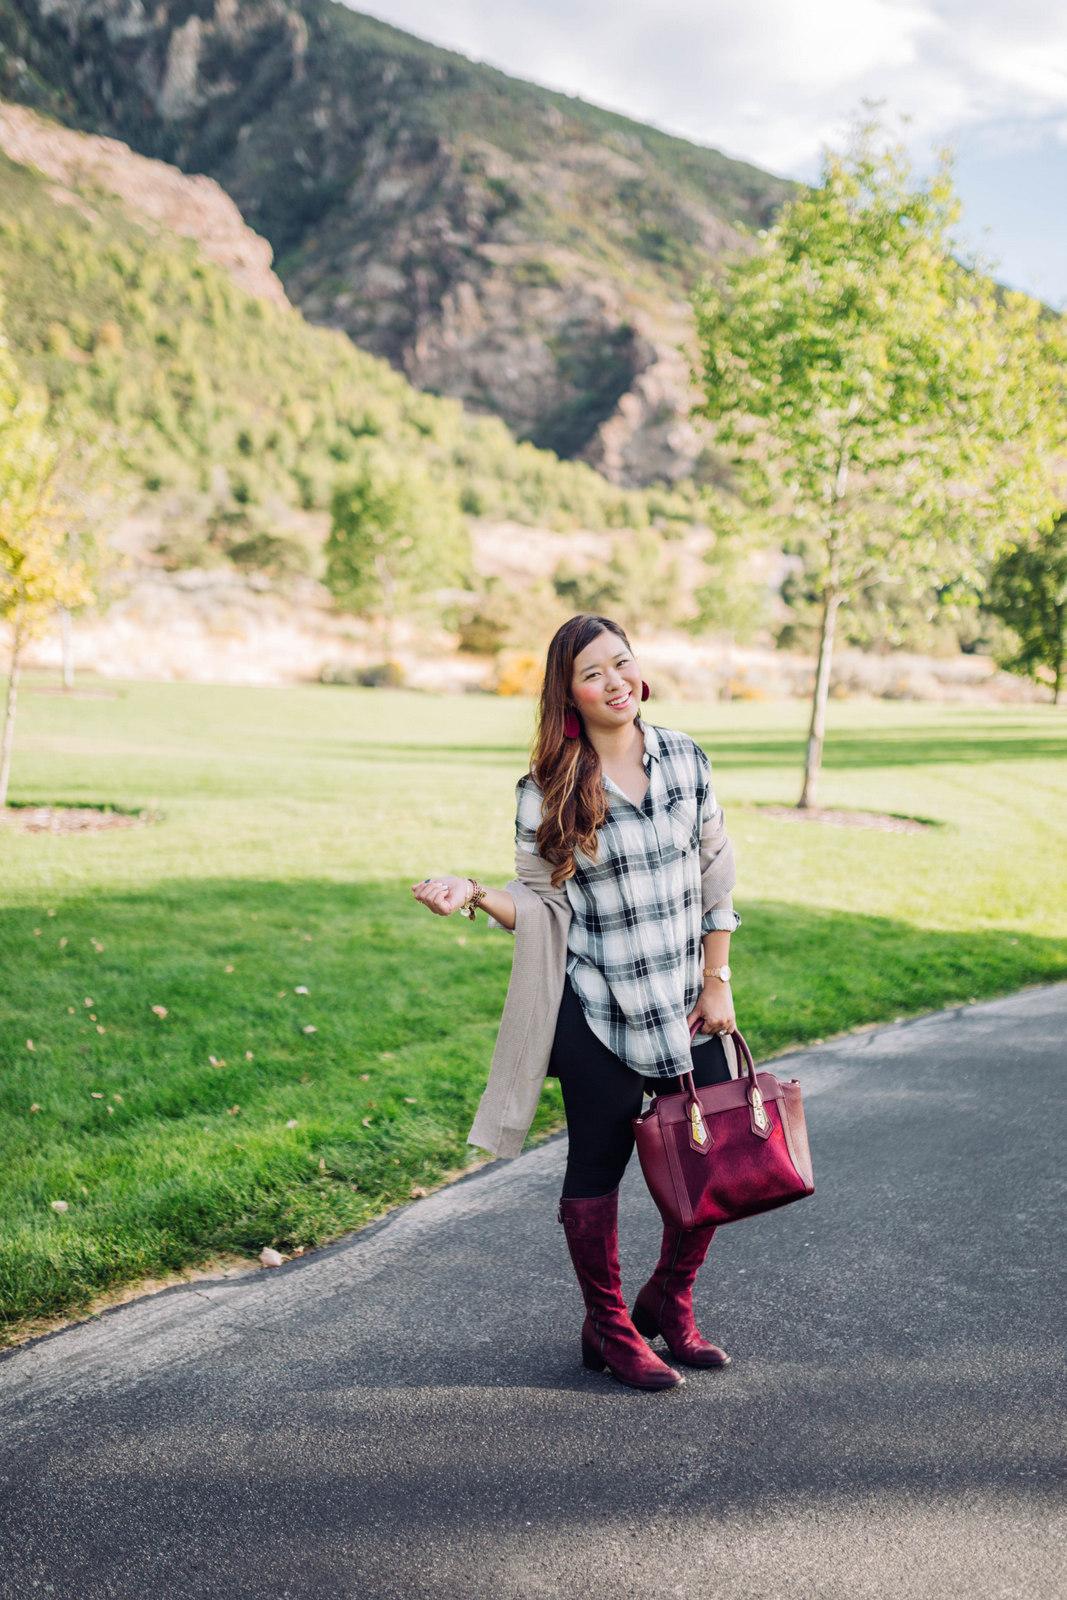 Boyfriend Cardigan and Boots Weather by Utah fashion blogger Sandy A La Mode